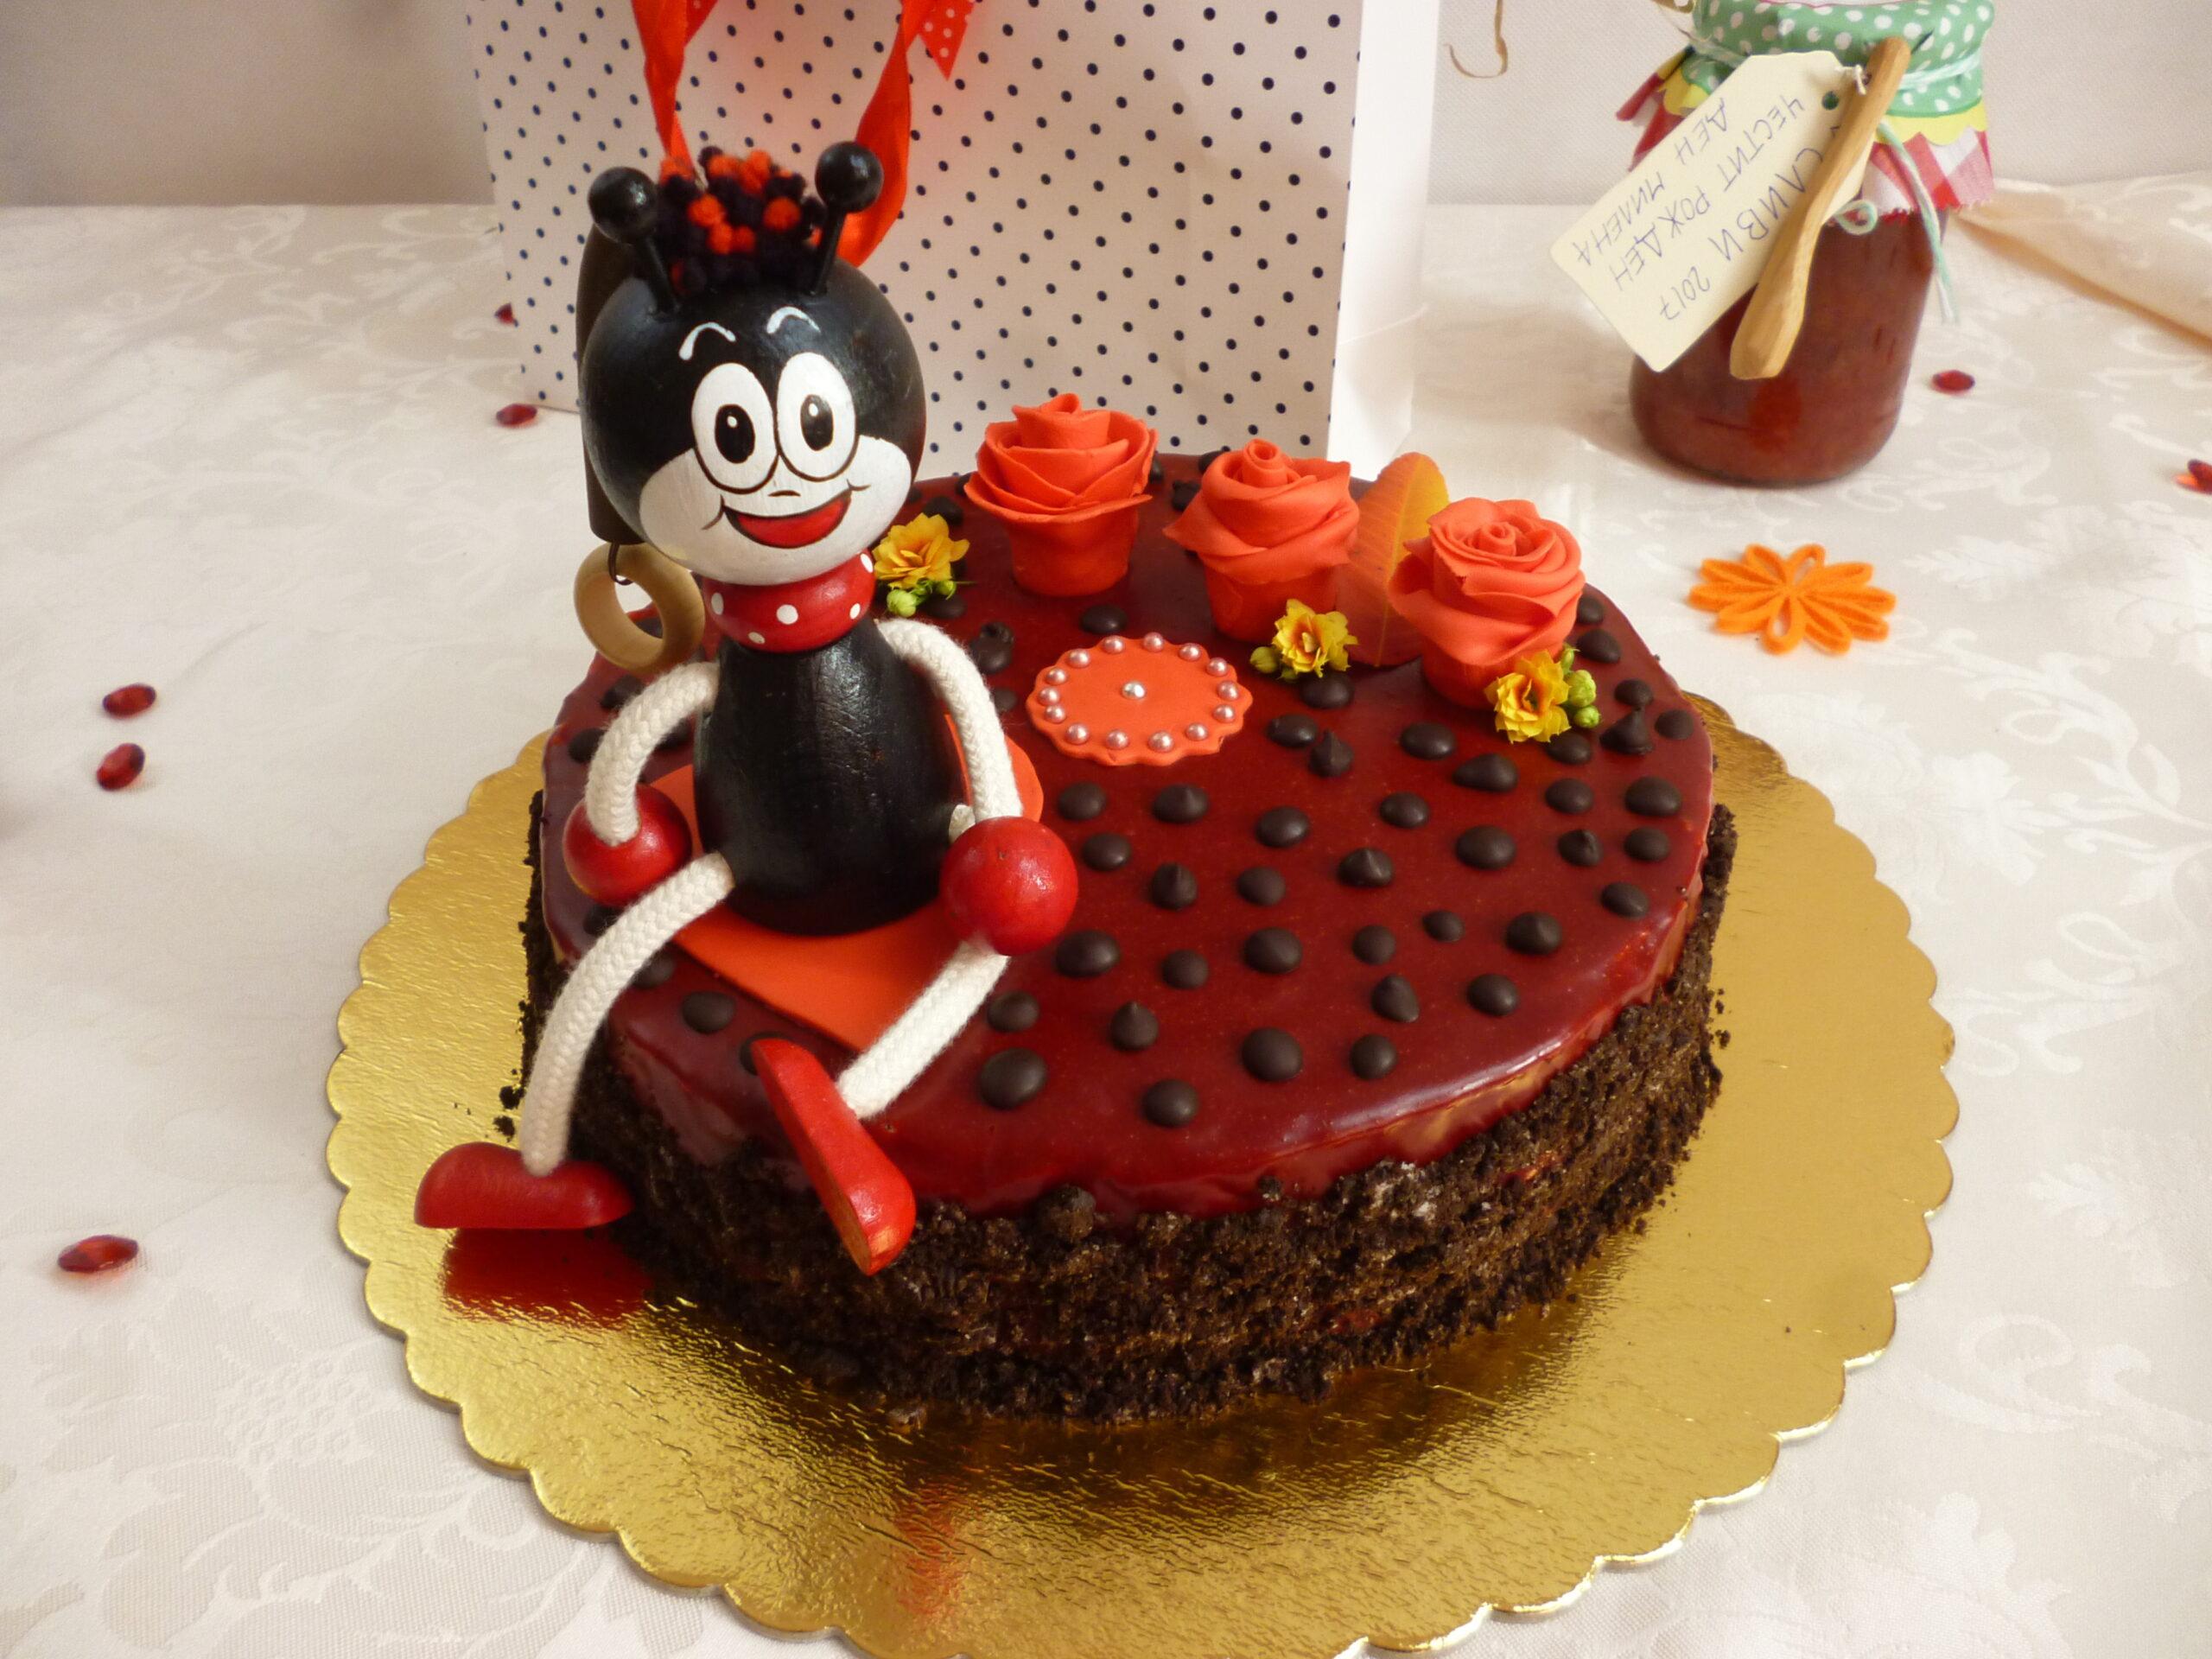 Oreo Ferdy Ant Cake